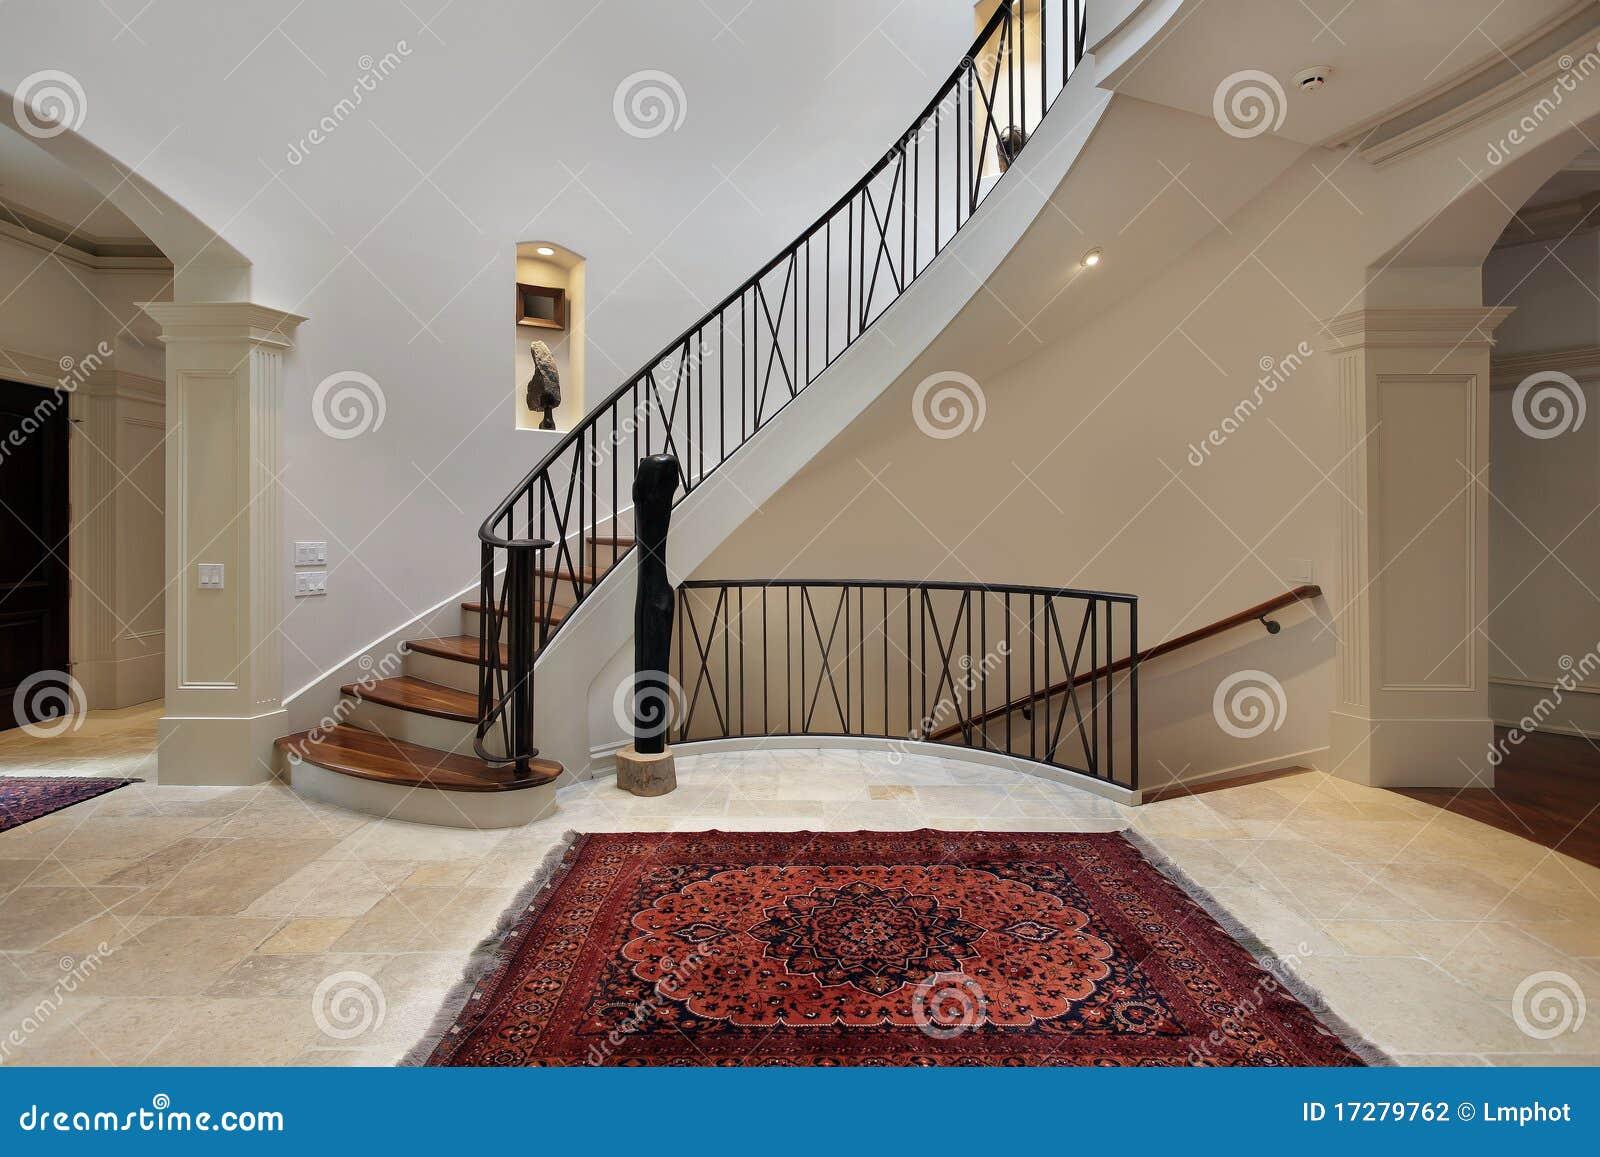 Grand Foyer Du Souss : Grand foyer avec l escalier circulaire photo stock image